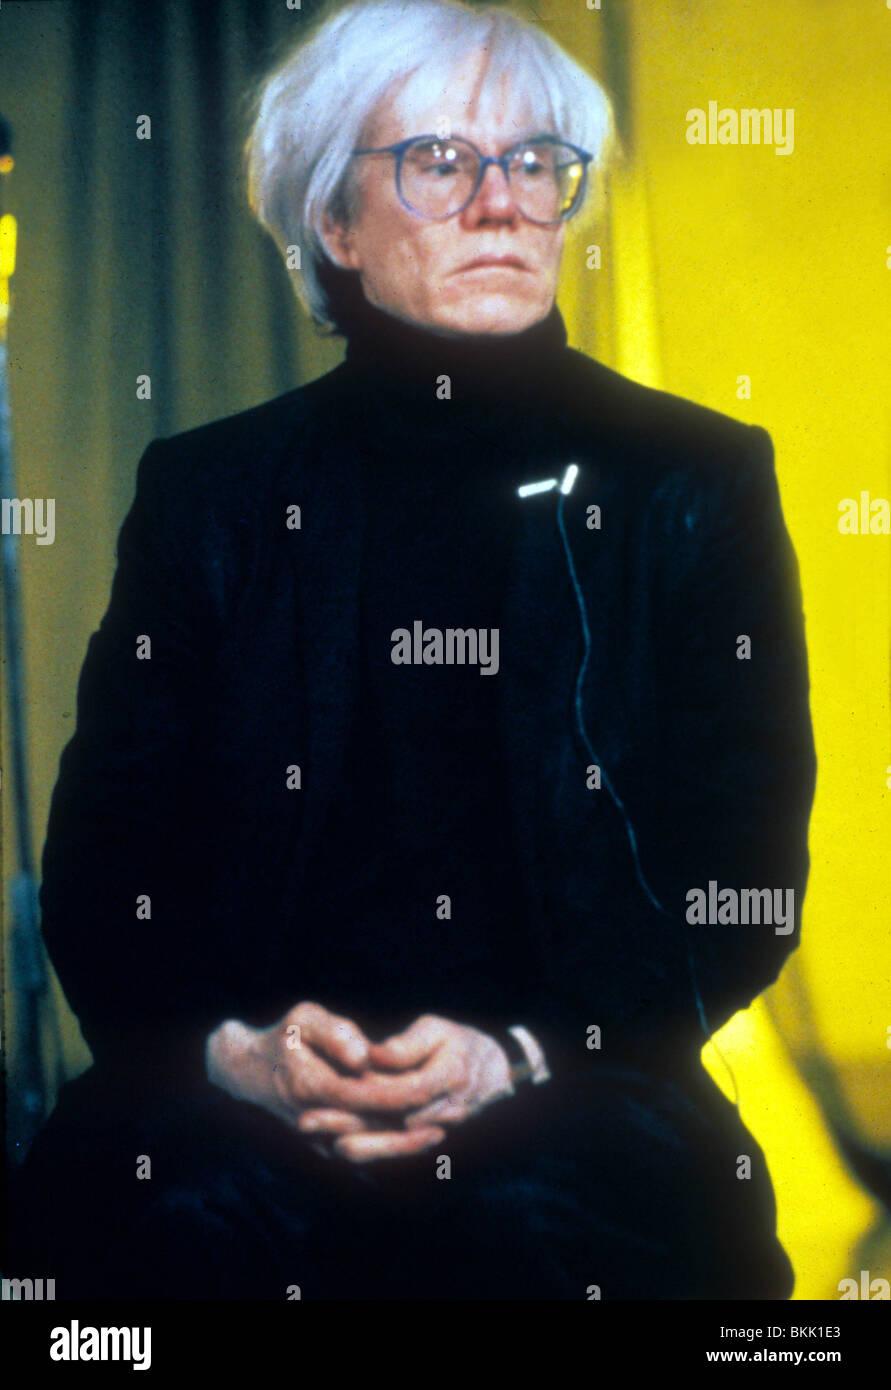 ANDY WARHOL PORTRAIT - Stock Image